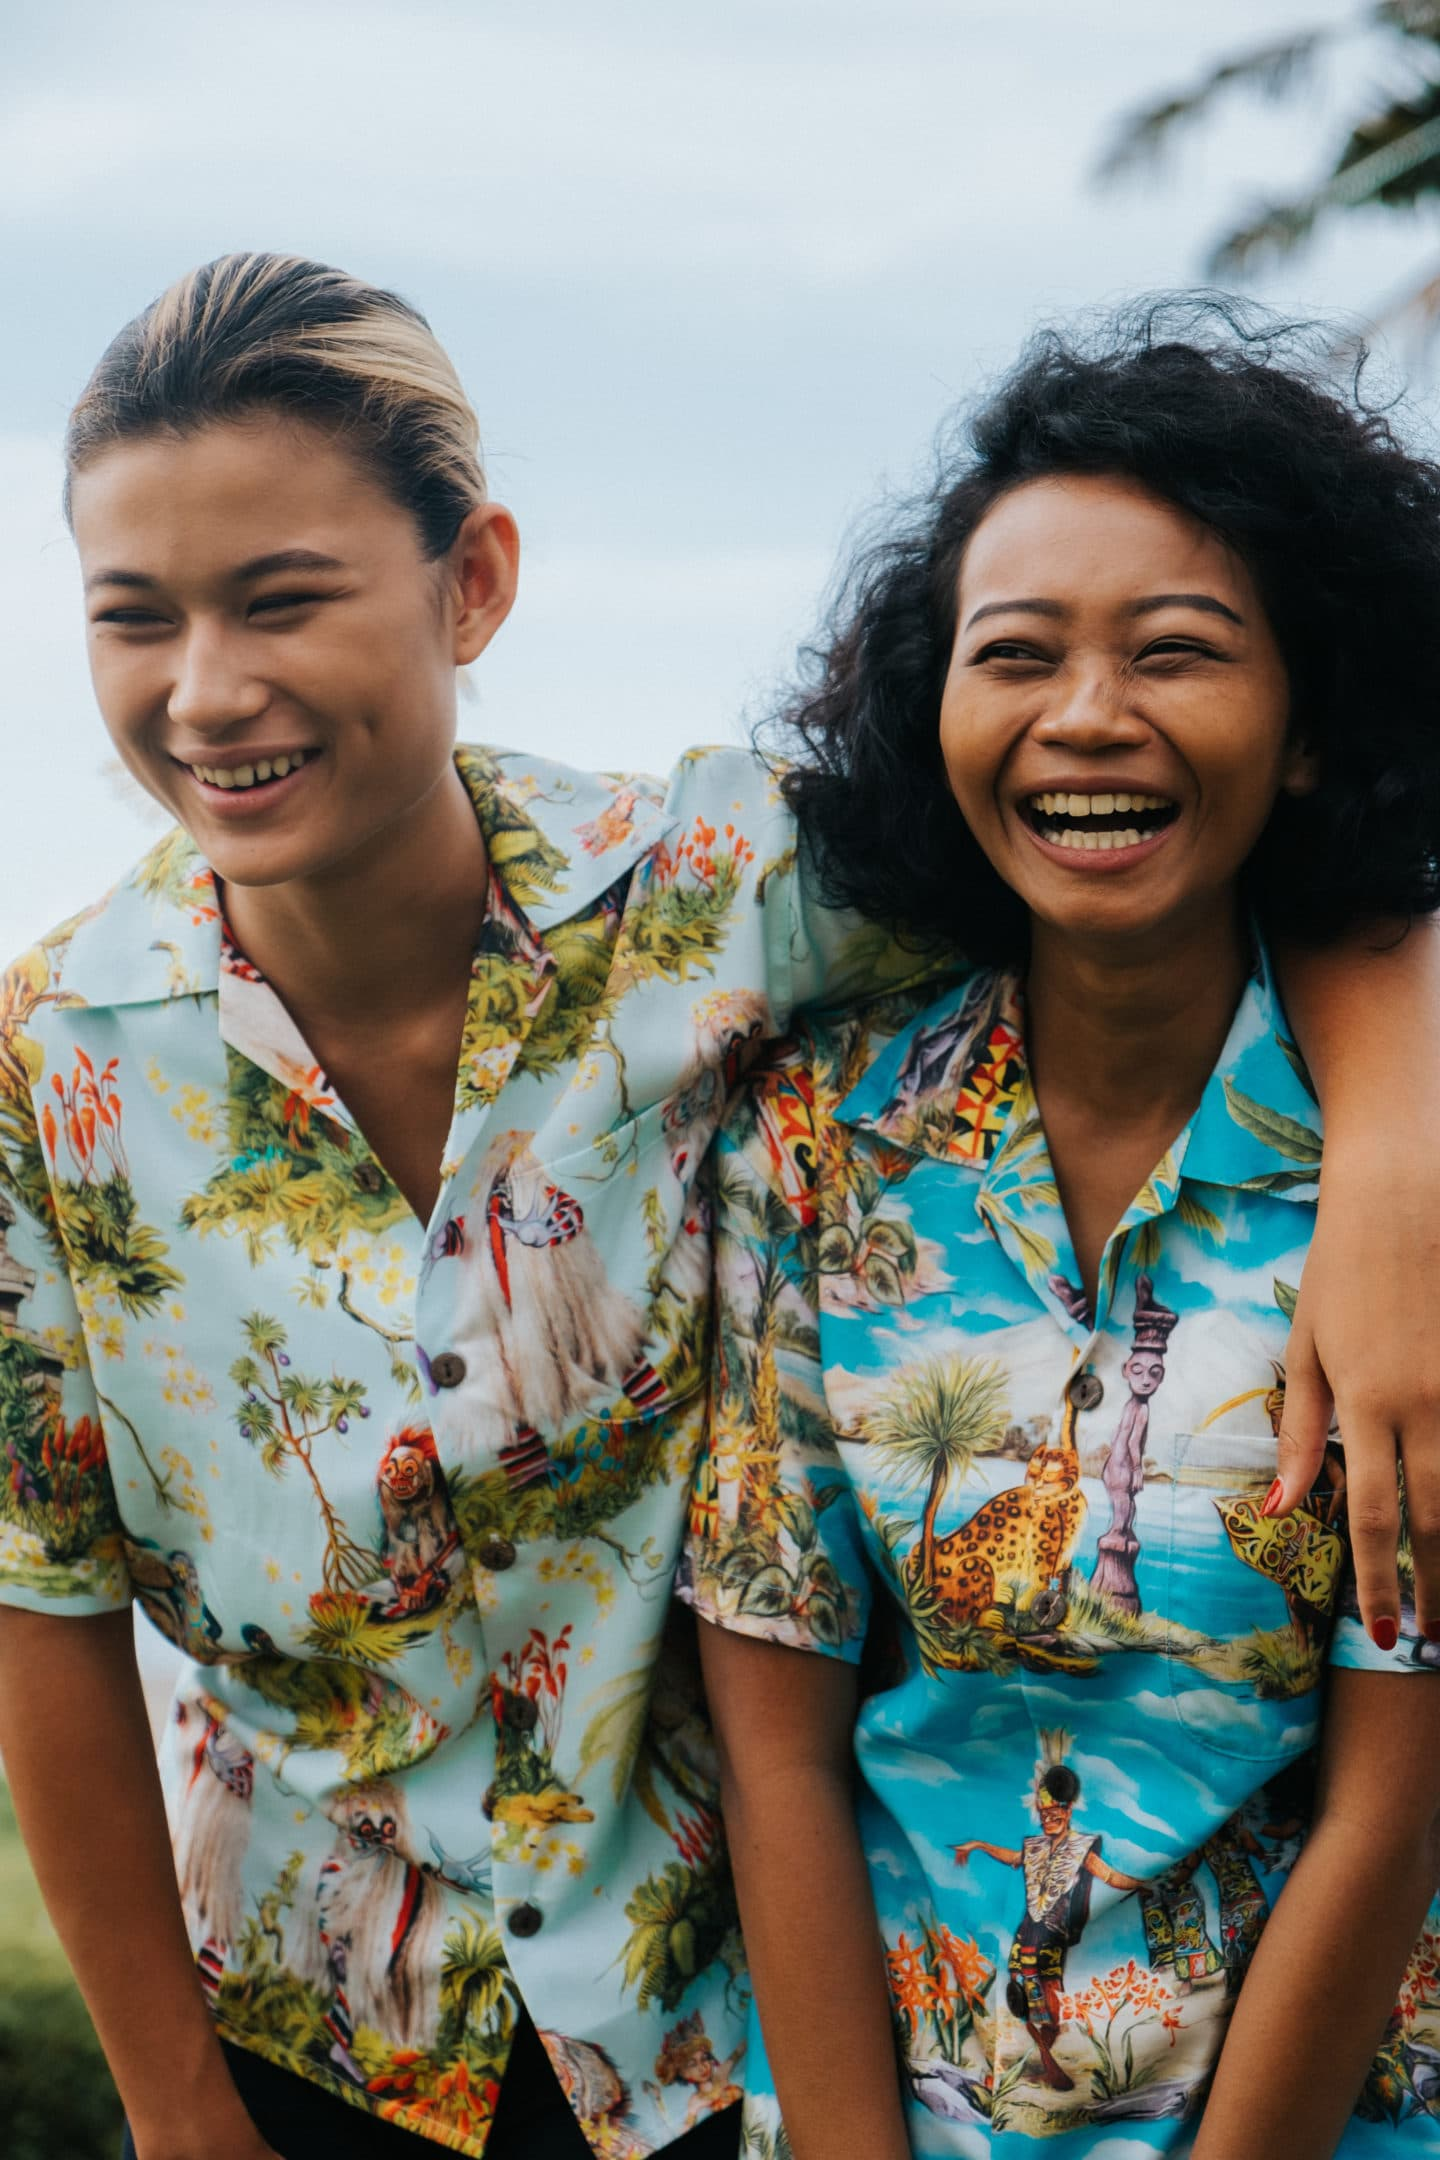 Potato Head Bali Beach Hawaiian shirt Spring/Summer 2019 collection girls